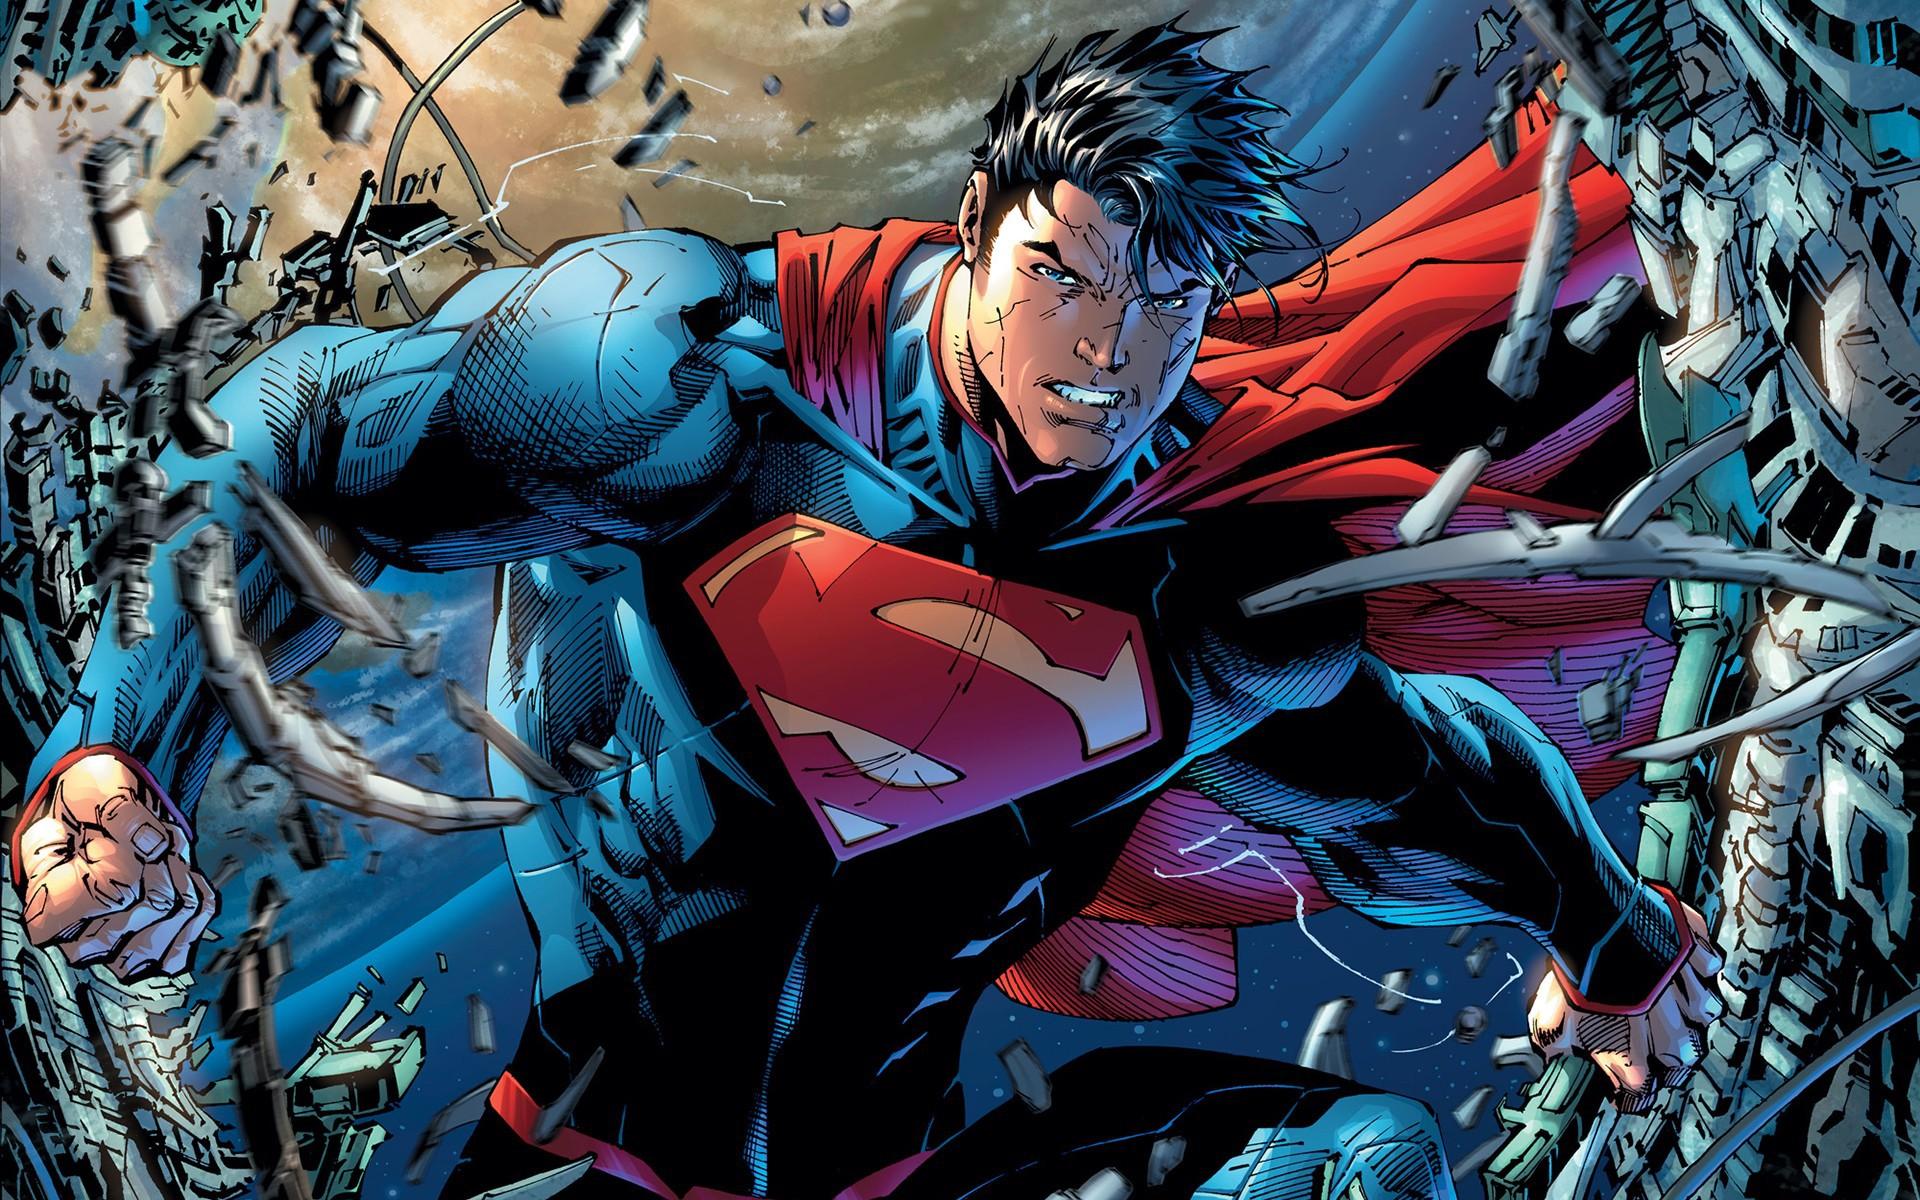 Jim Lee Superman New 52 wallpaper 225778 1920x1200